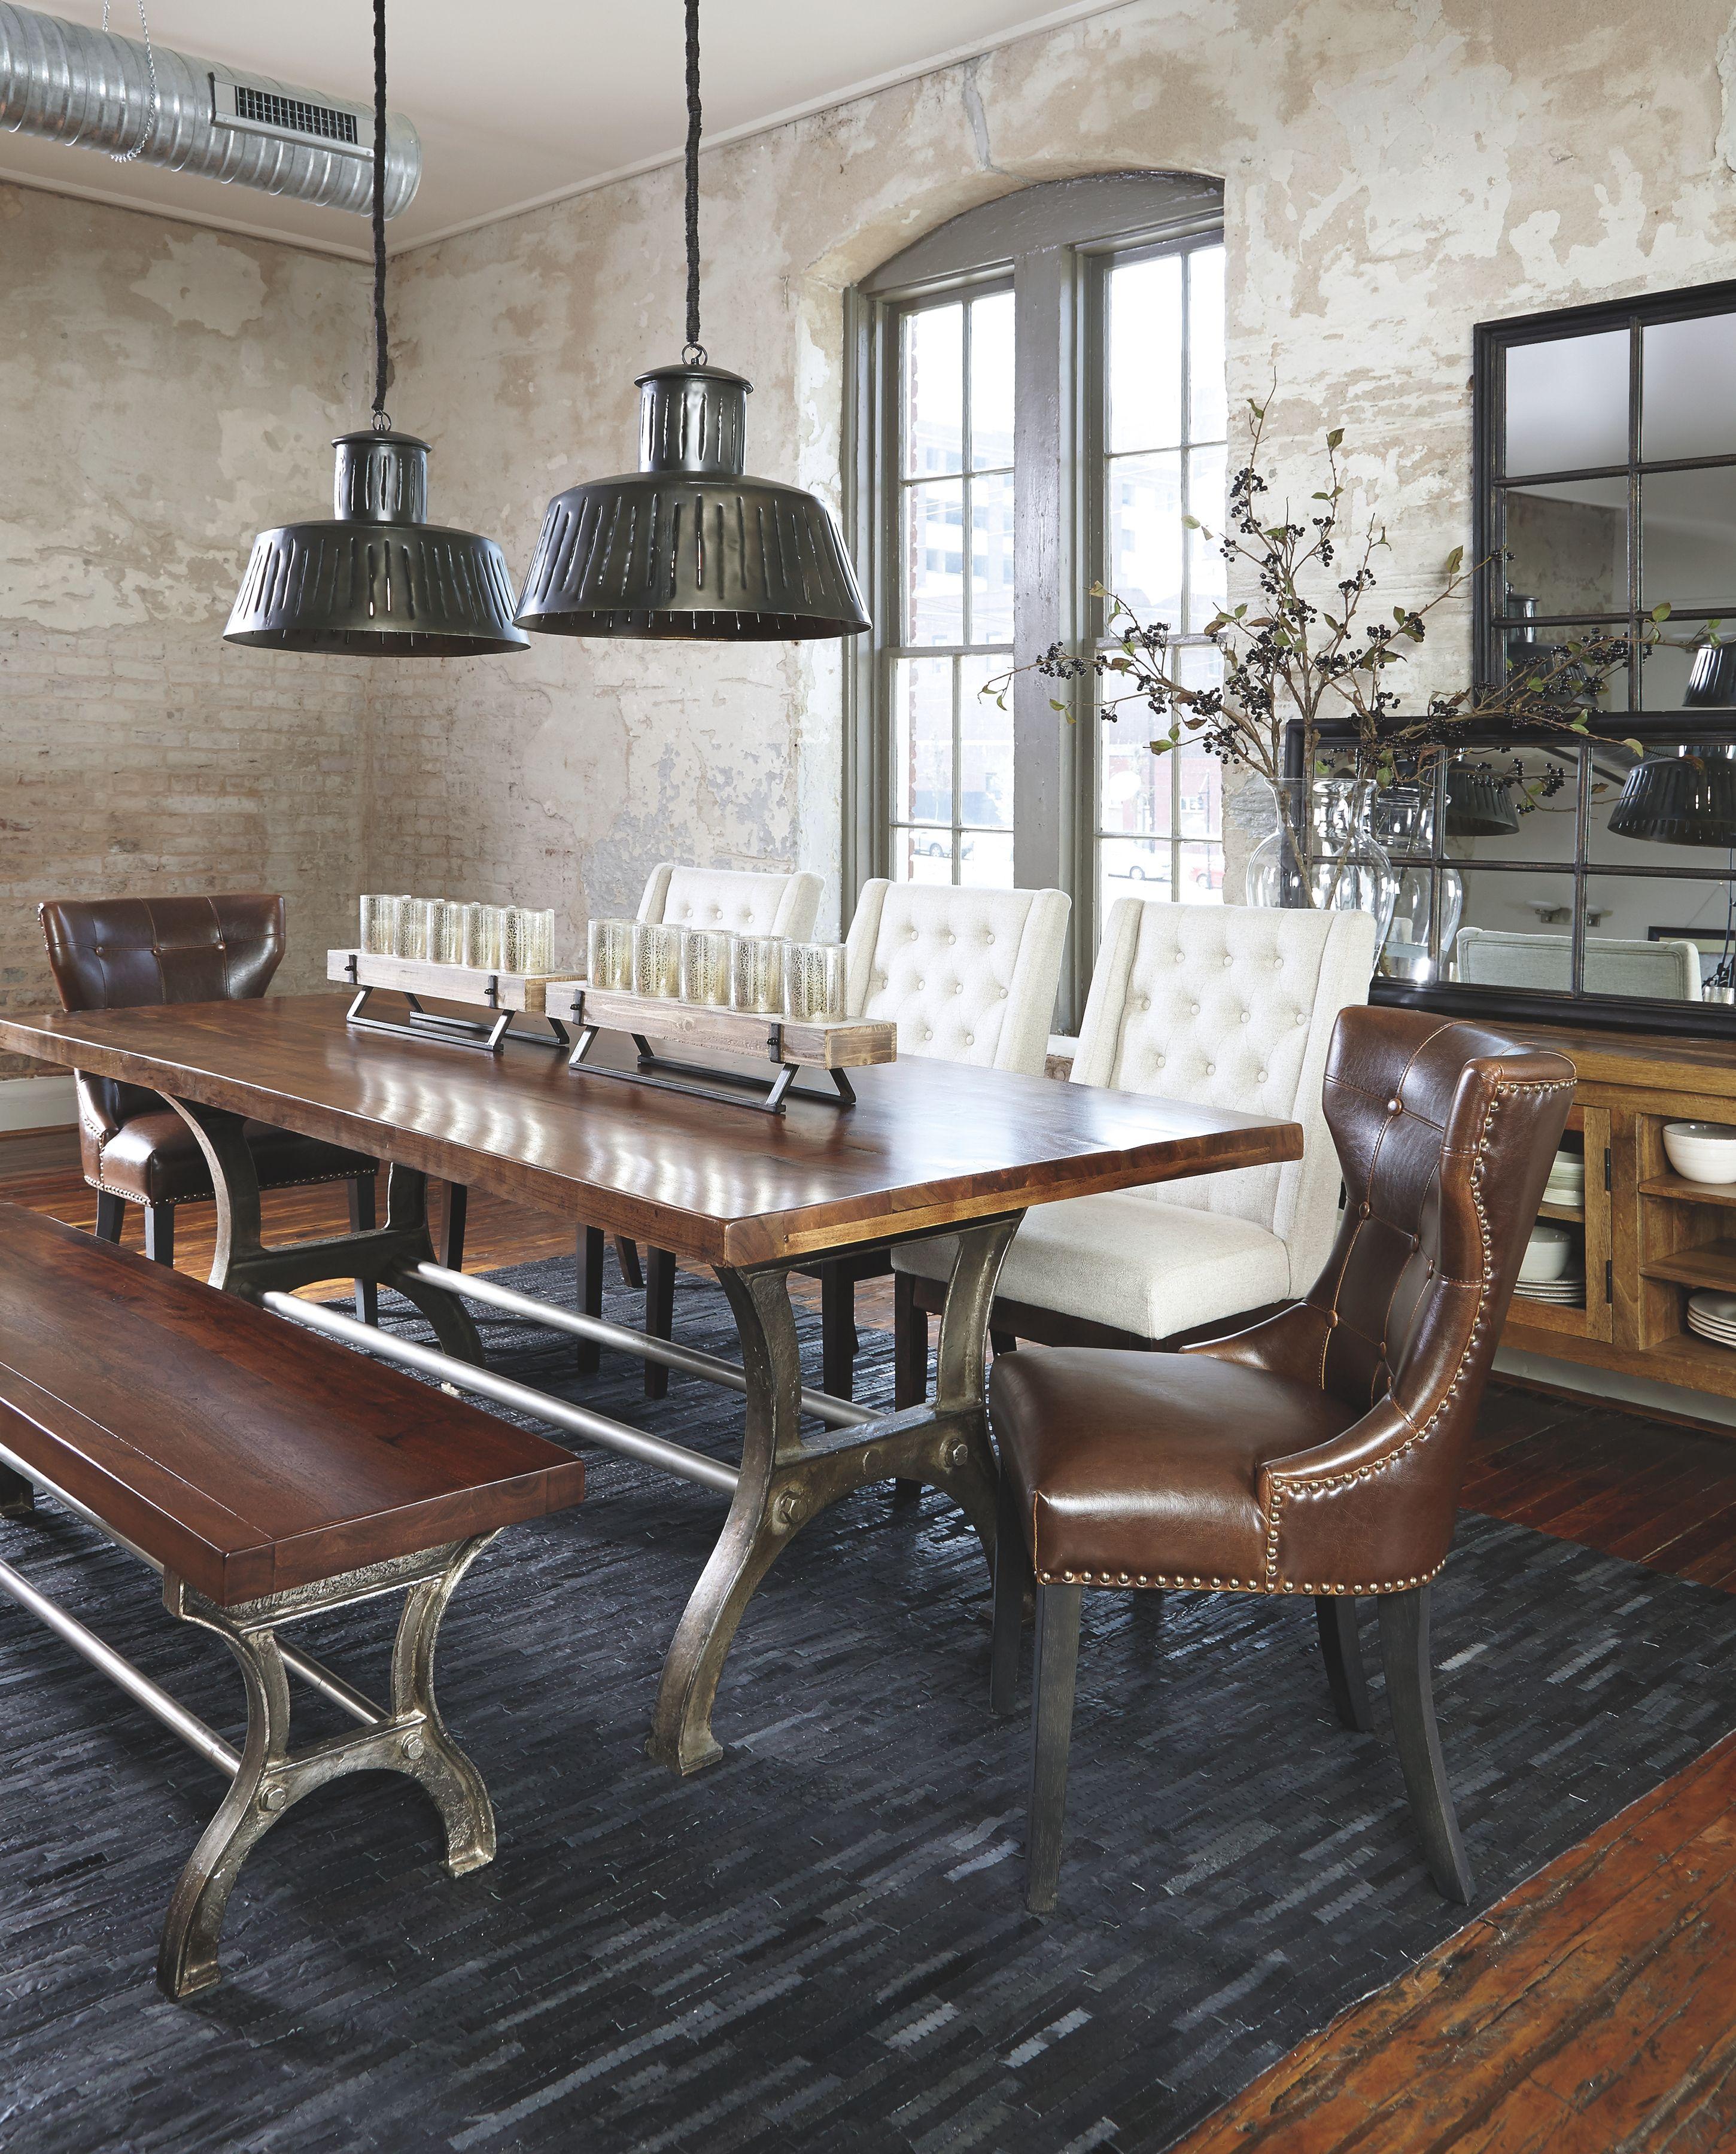 Ranimar Dining Room Table Rustic Brown